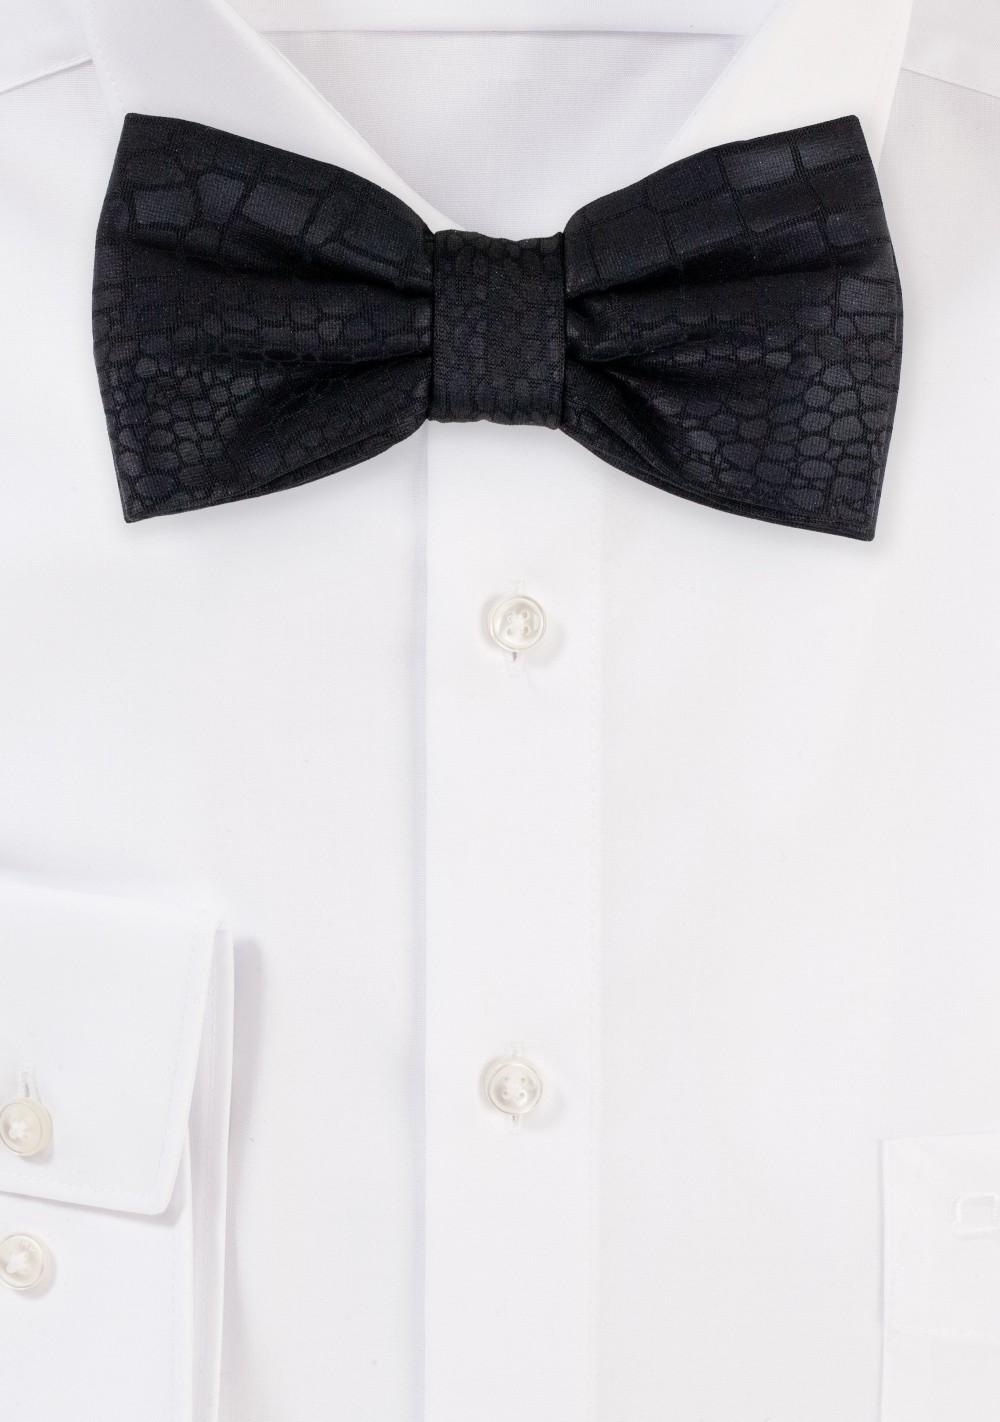 Croc Print Bow Tie in Black